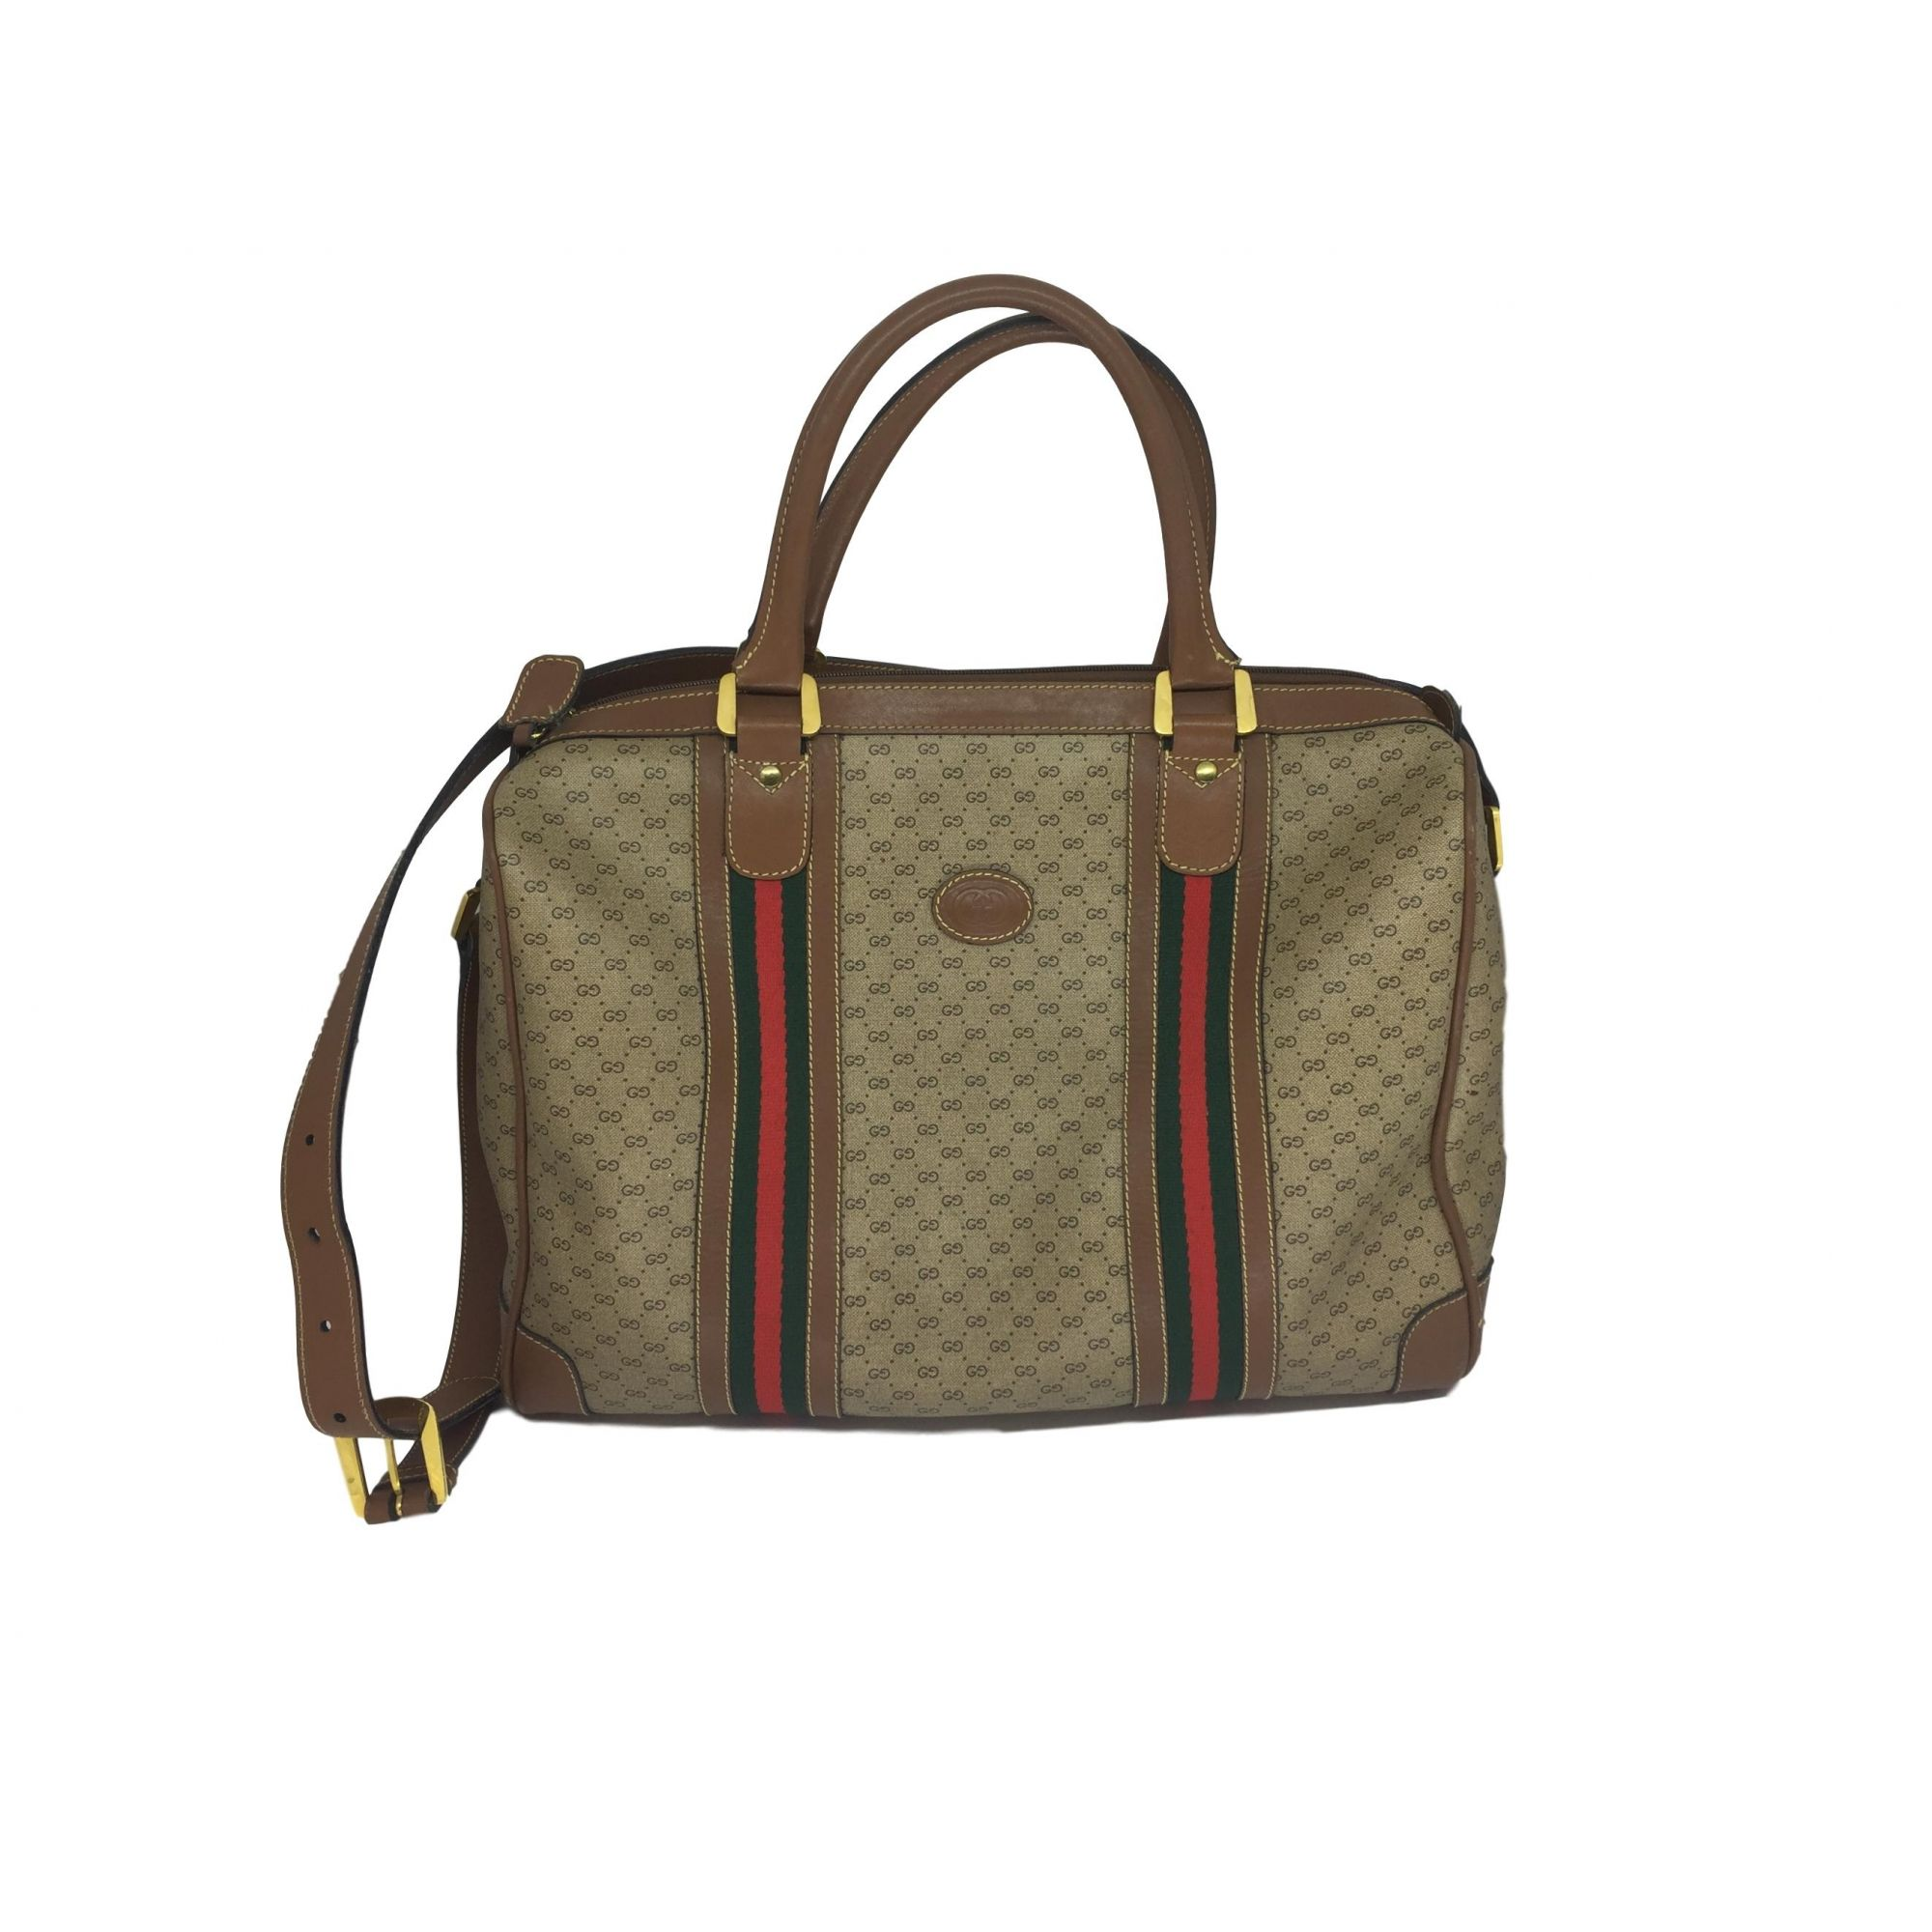 91fce7fa8 Mala Gucci Monograma listras - Paula Frank | Bolsas de luxo ...